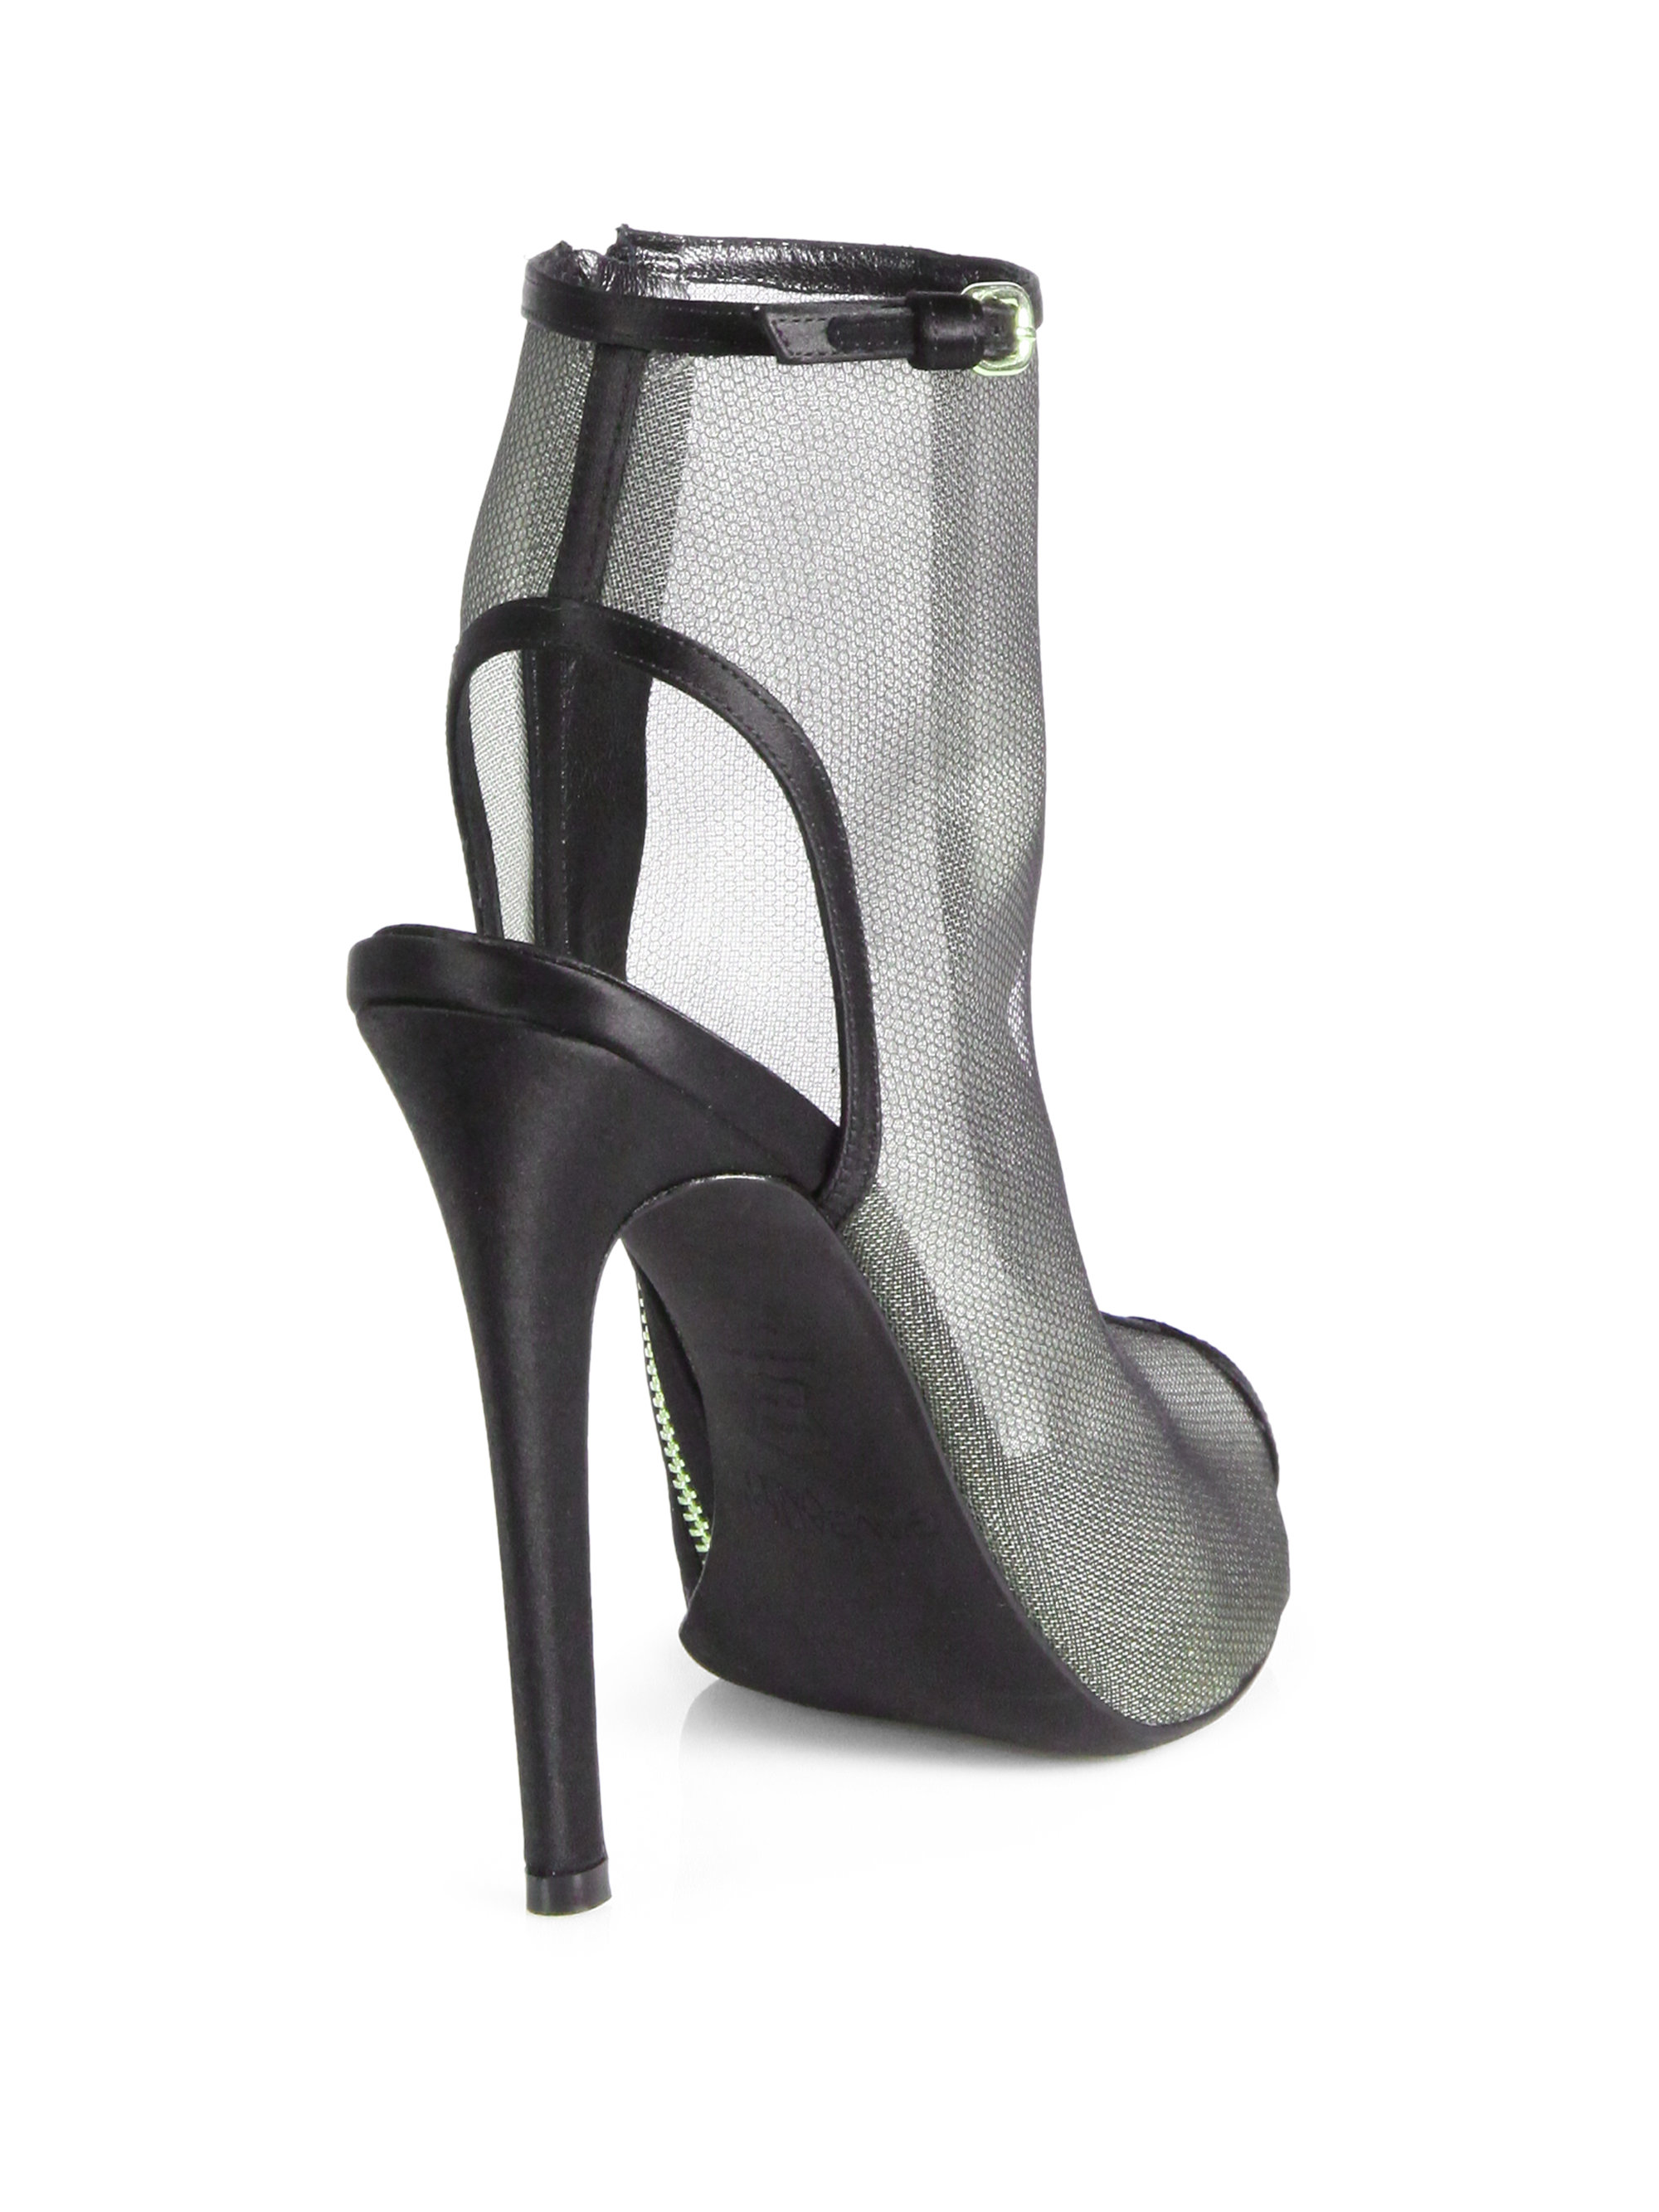 buy cheap footaction best cheap price Giambattista Valli Peep-Toe Mesh Booties new styles sale online sale pick a best mXynC